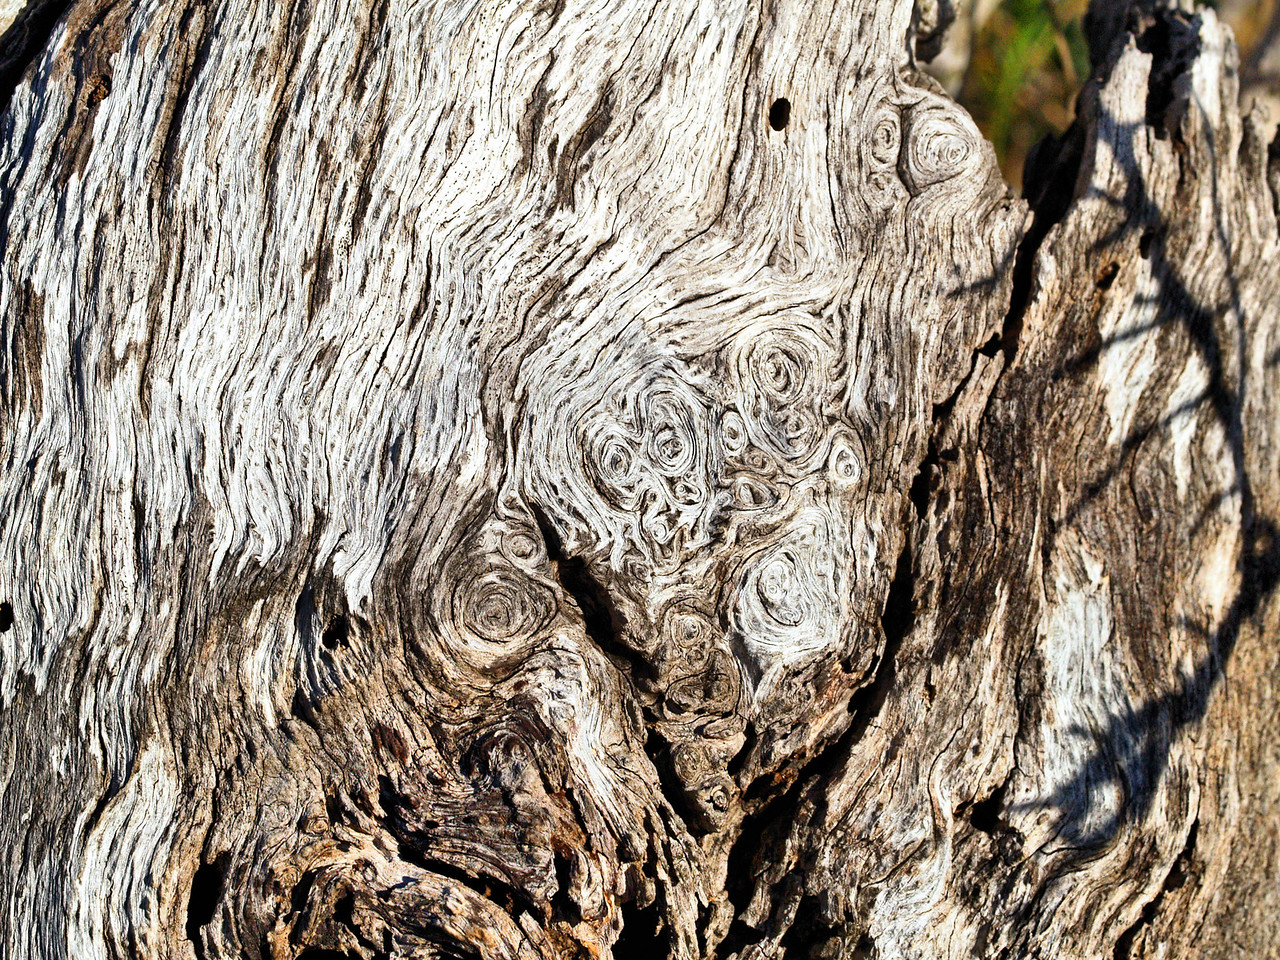 OLYMPUS DIGITAL CAMERA--Interesting swirling patterns in the dead tree.